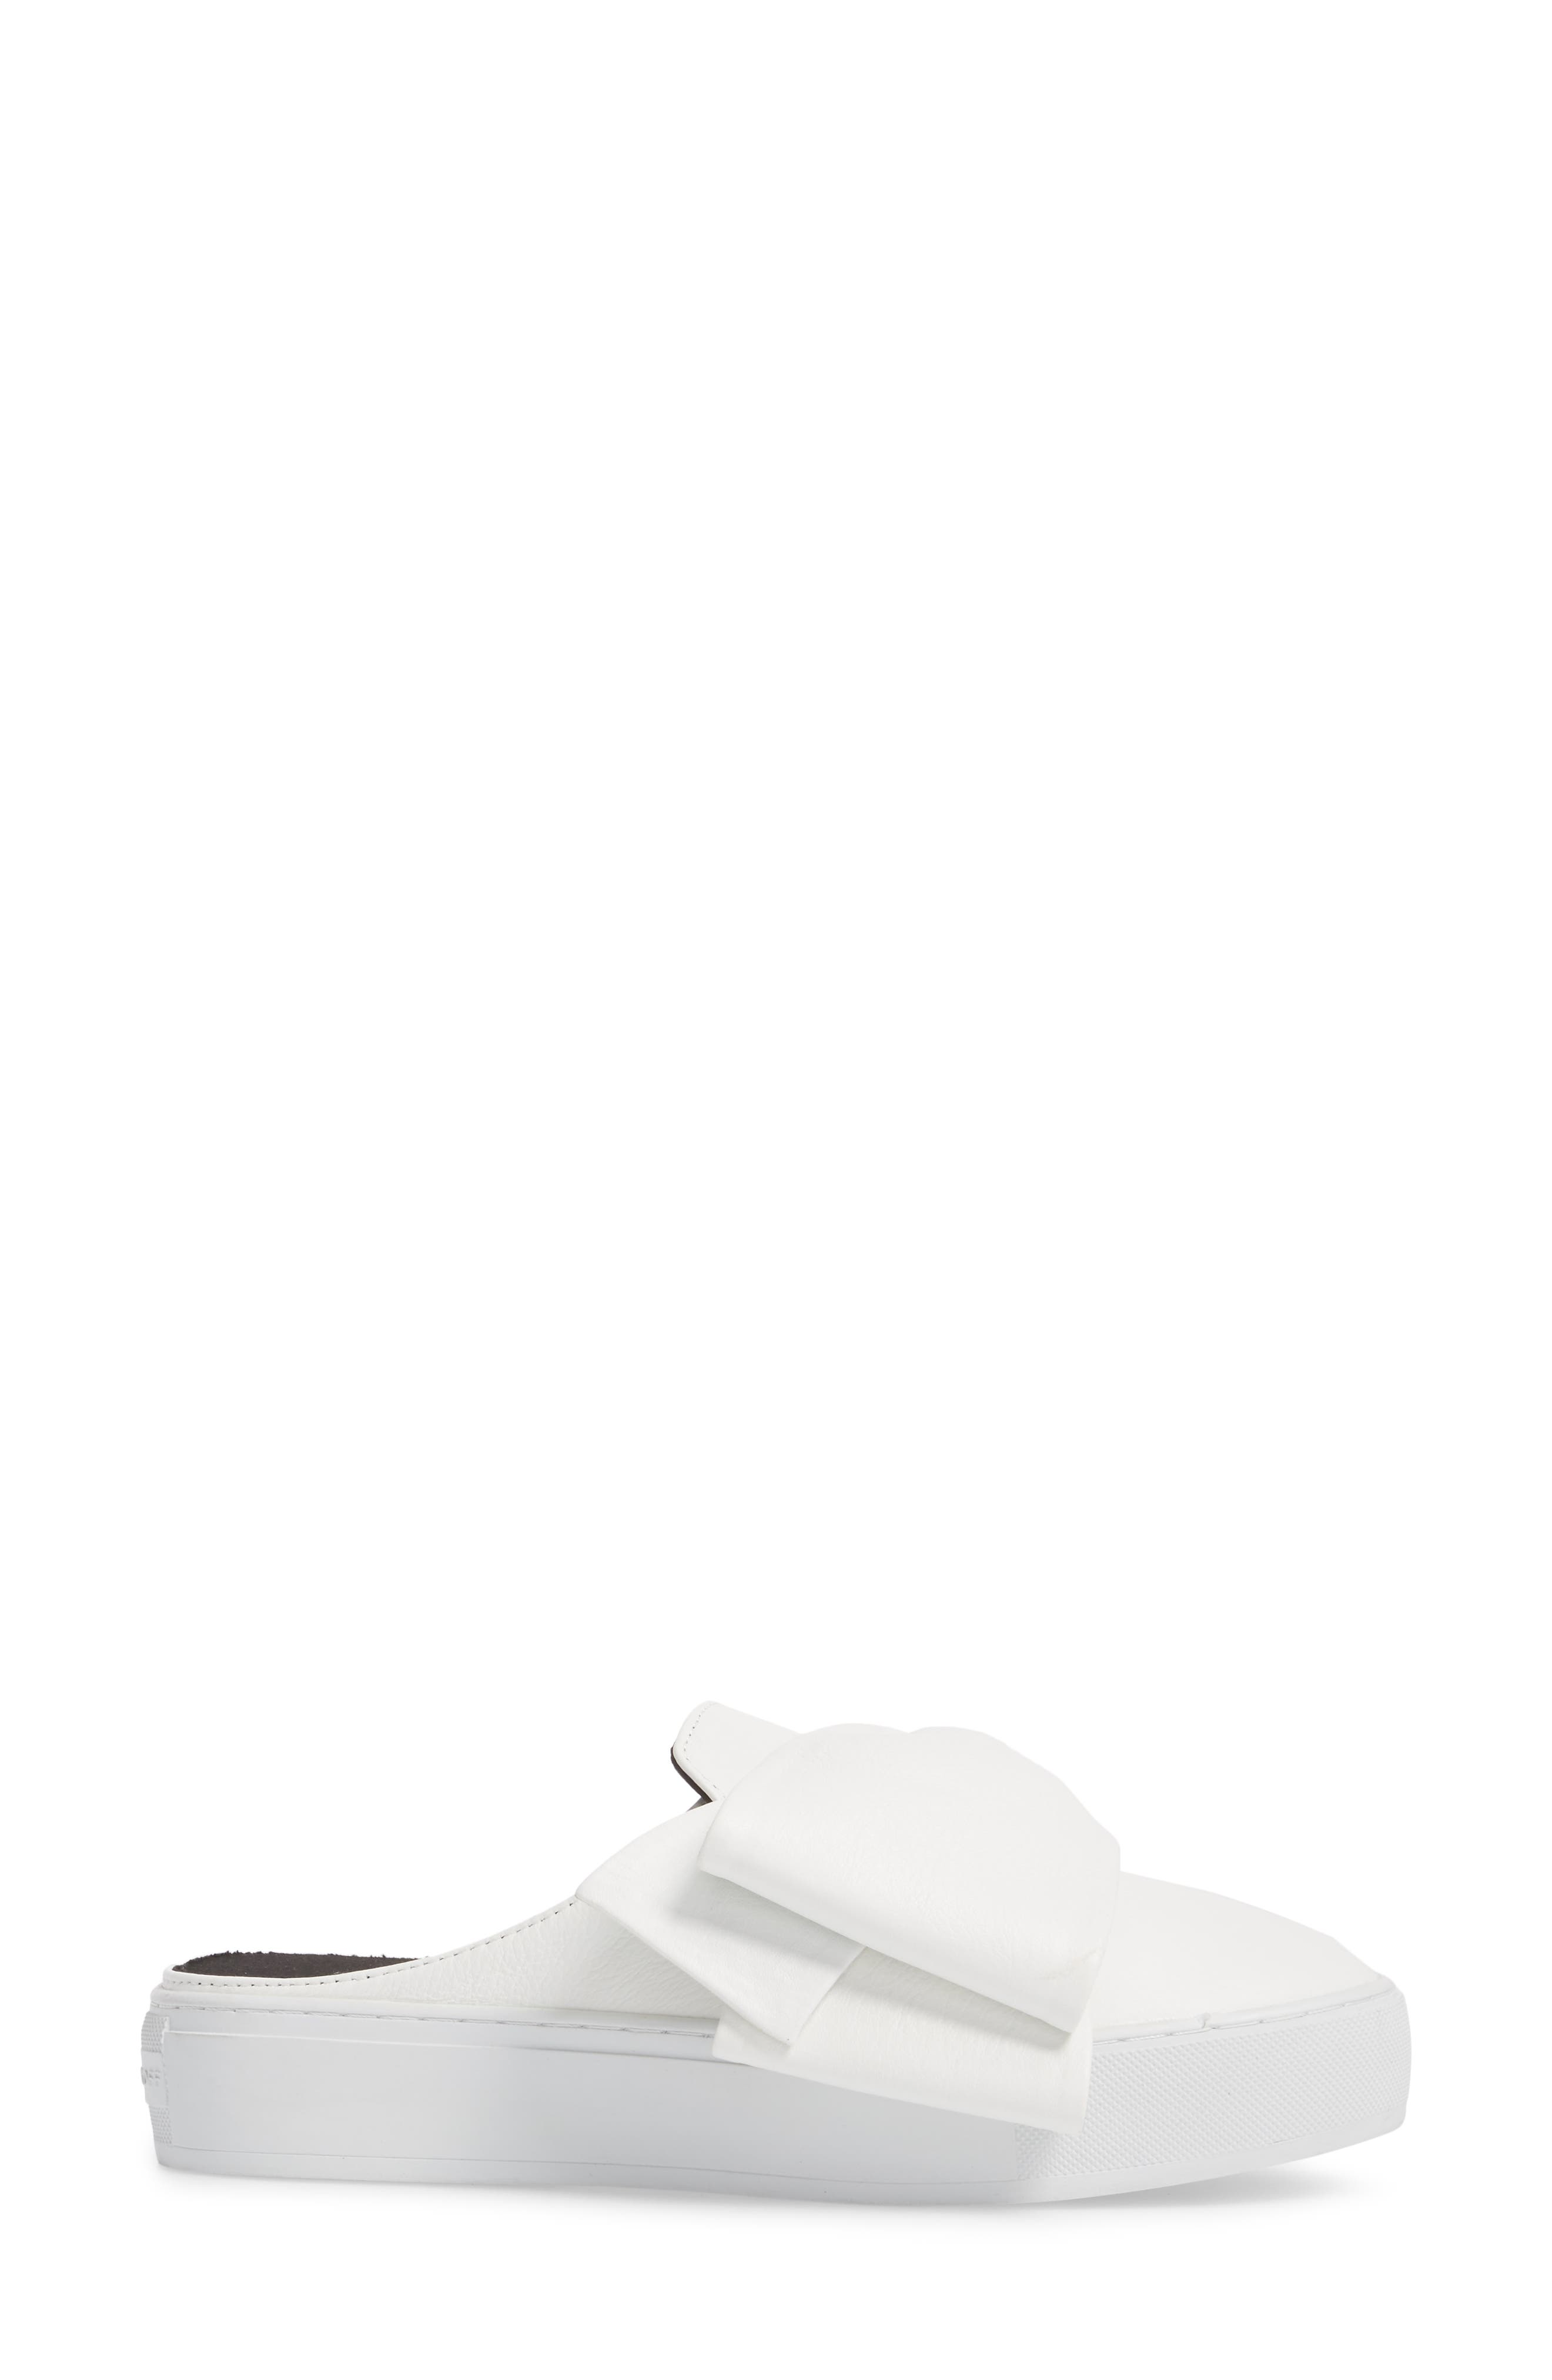 Neva Sneaker Mule,                             Alternate thumbnail 9, color,